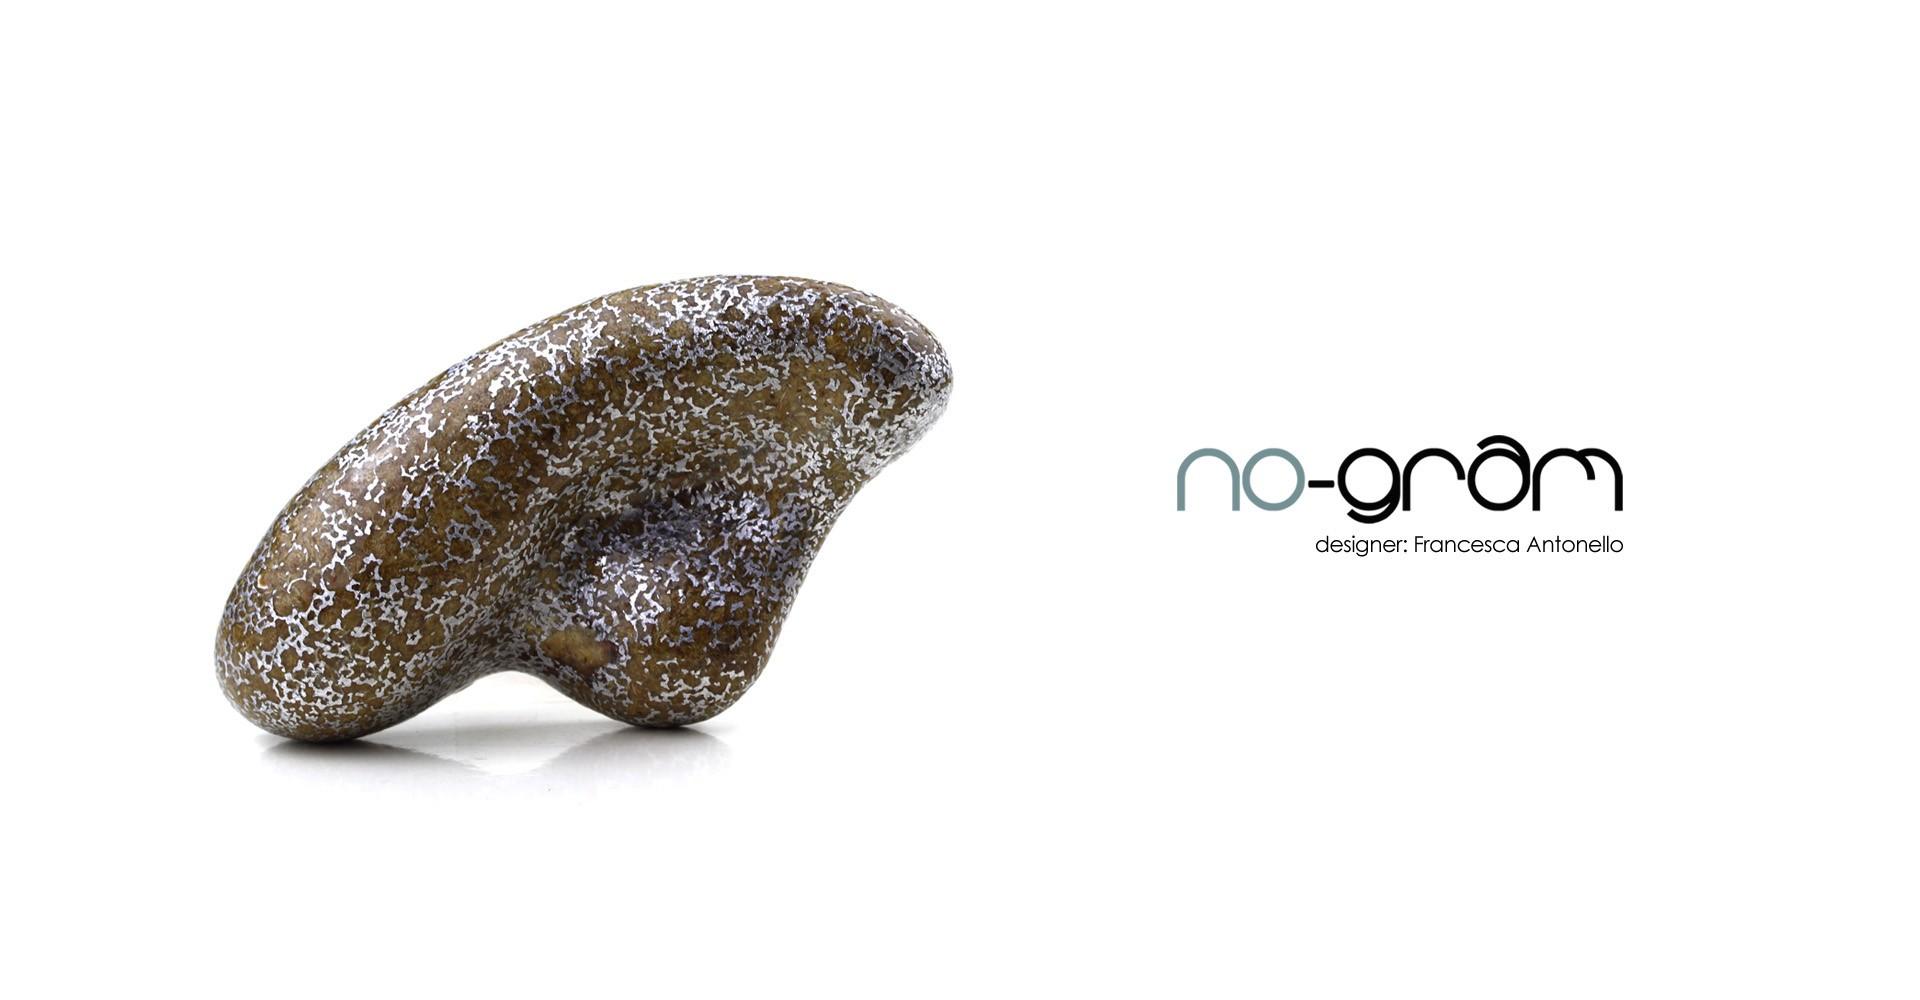 Francesca Antonello - Italian designer | no-gram |